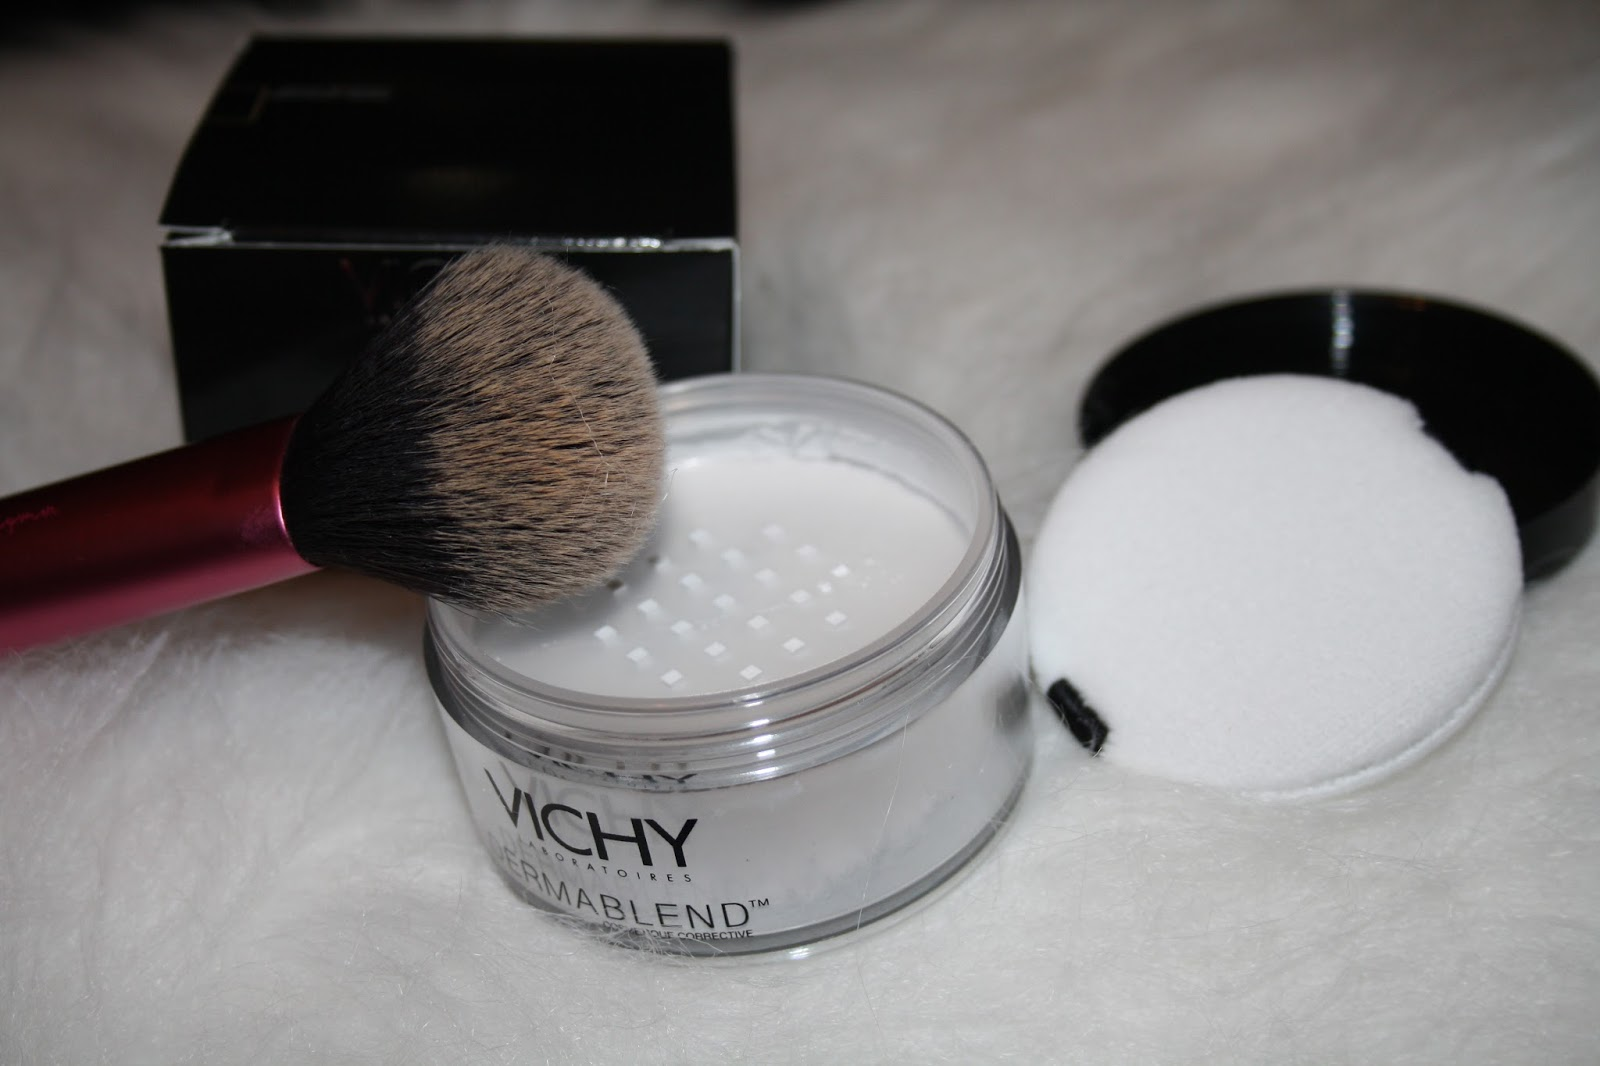 Vichy Dermablend translucent powder